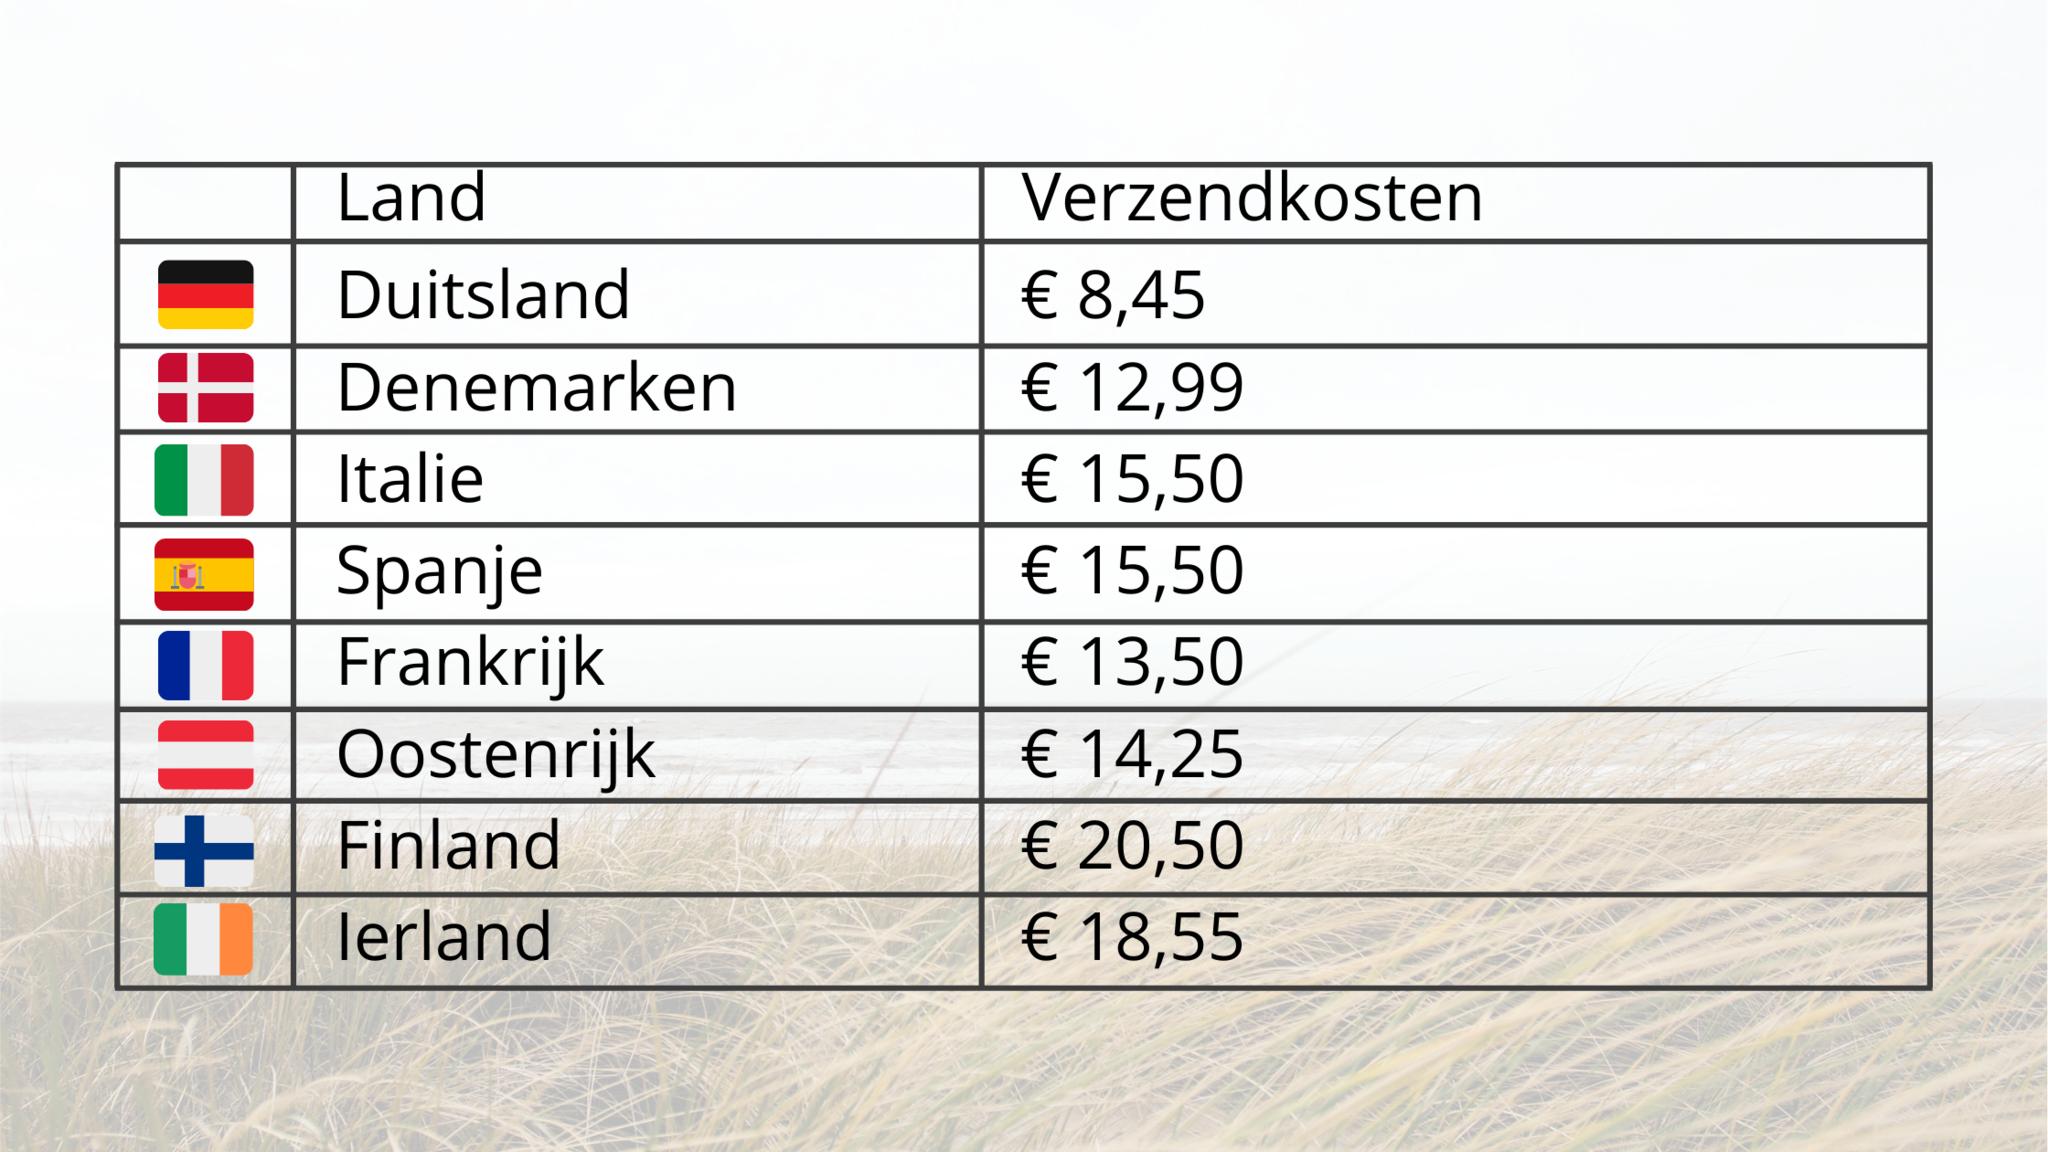 Tabel verzendkosten landen Europa